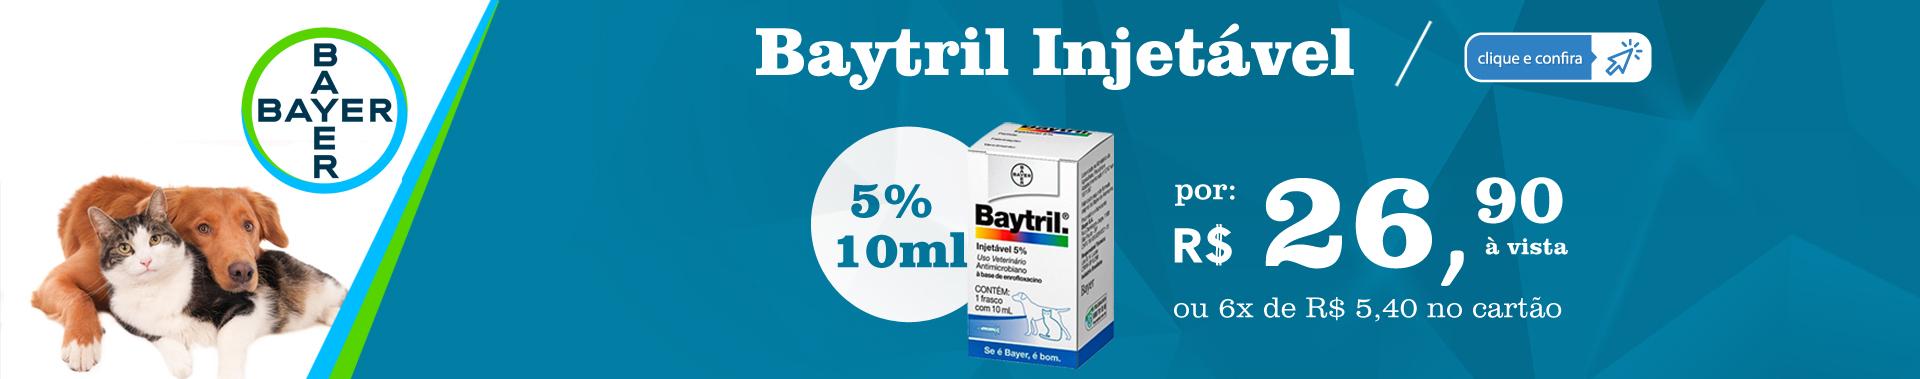 Baytril Injetável 5% 10mL - Bayer